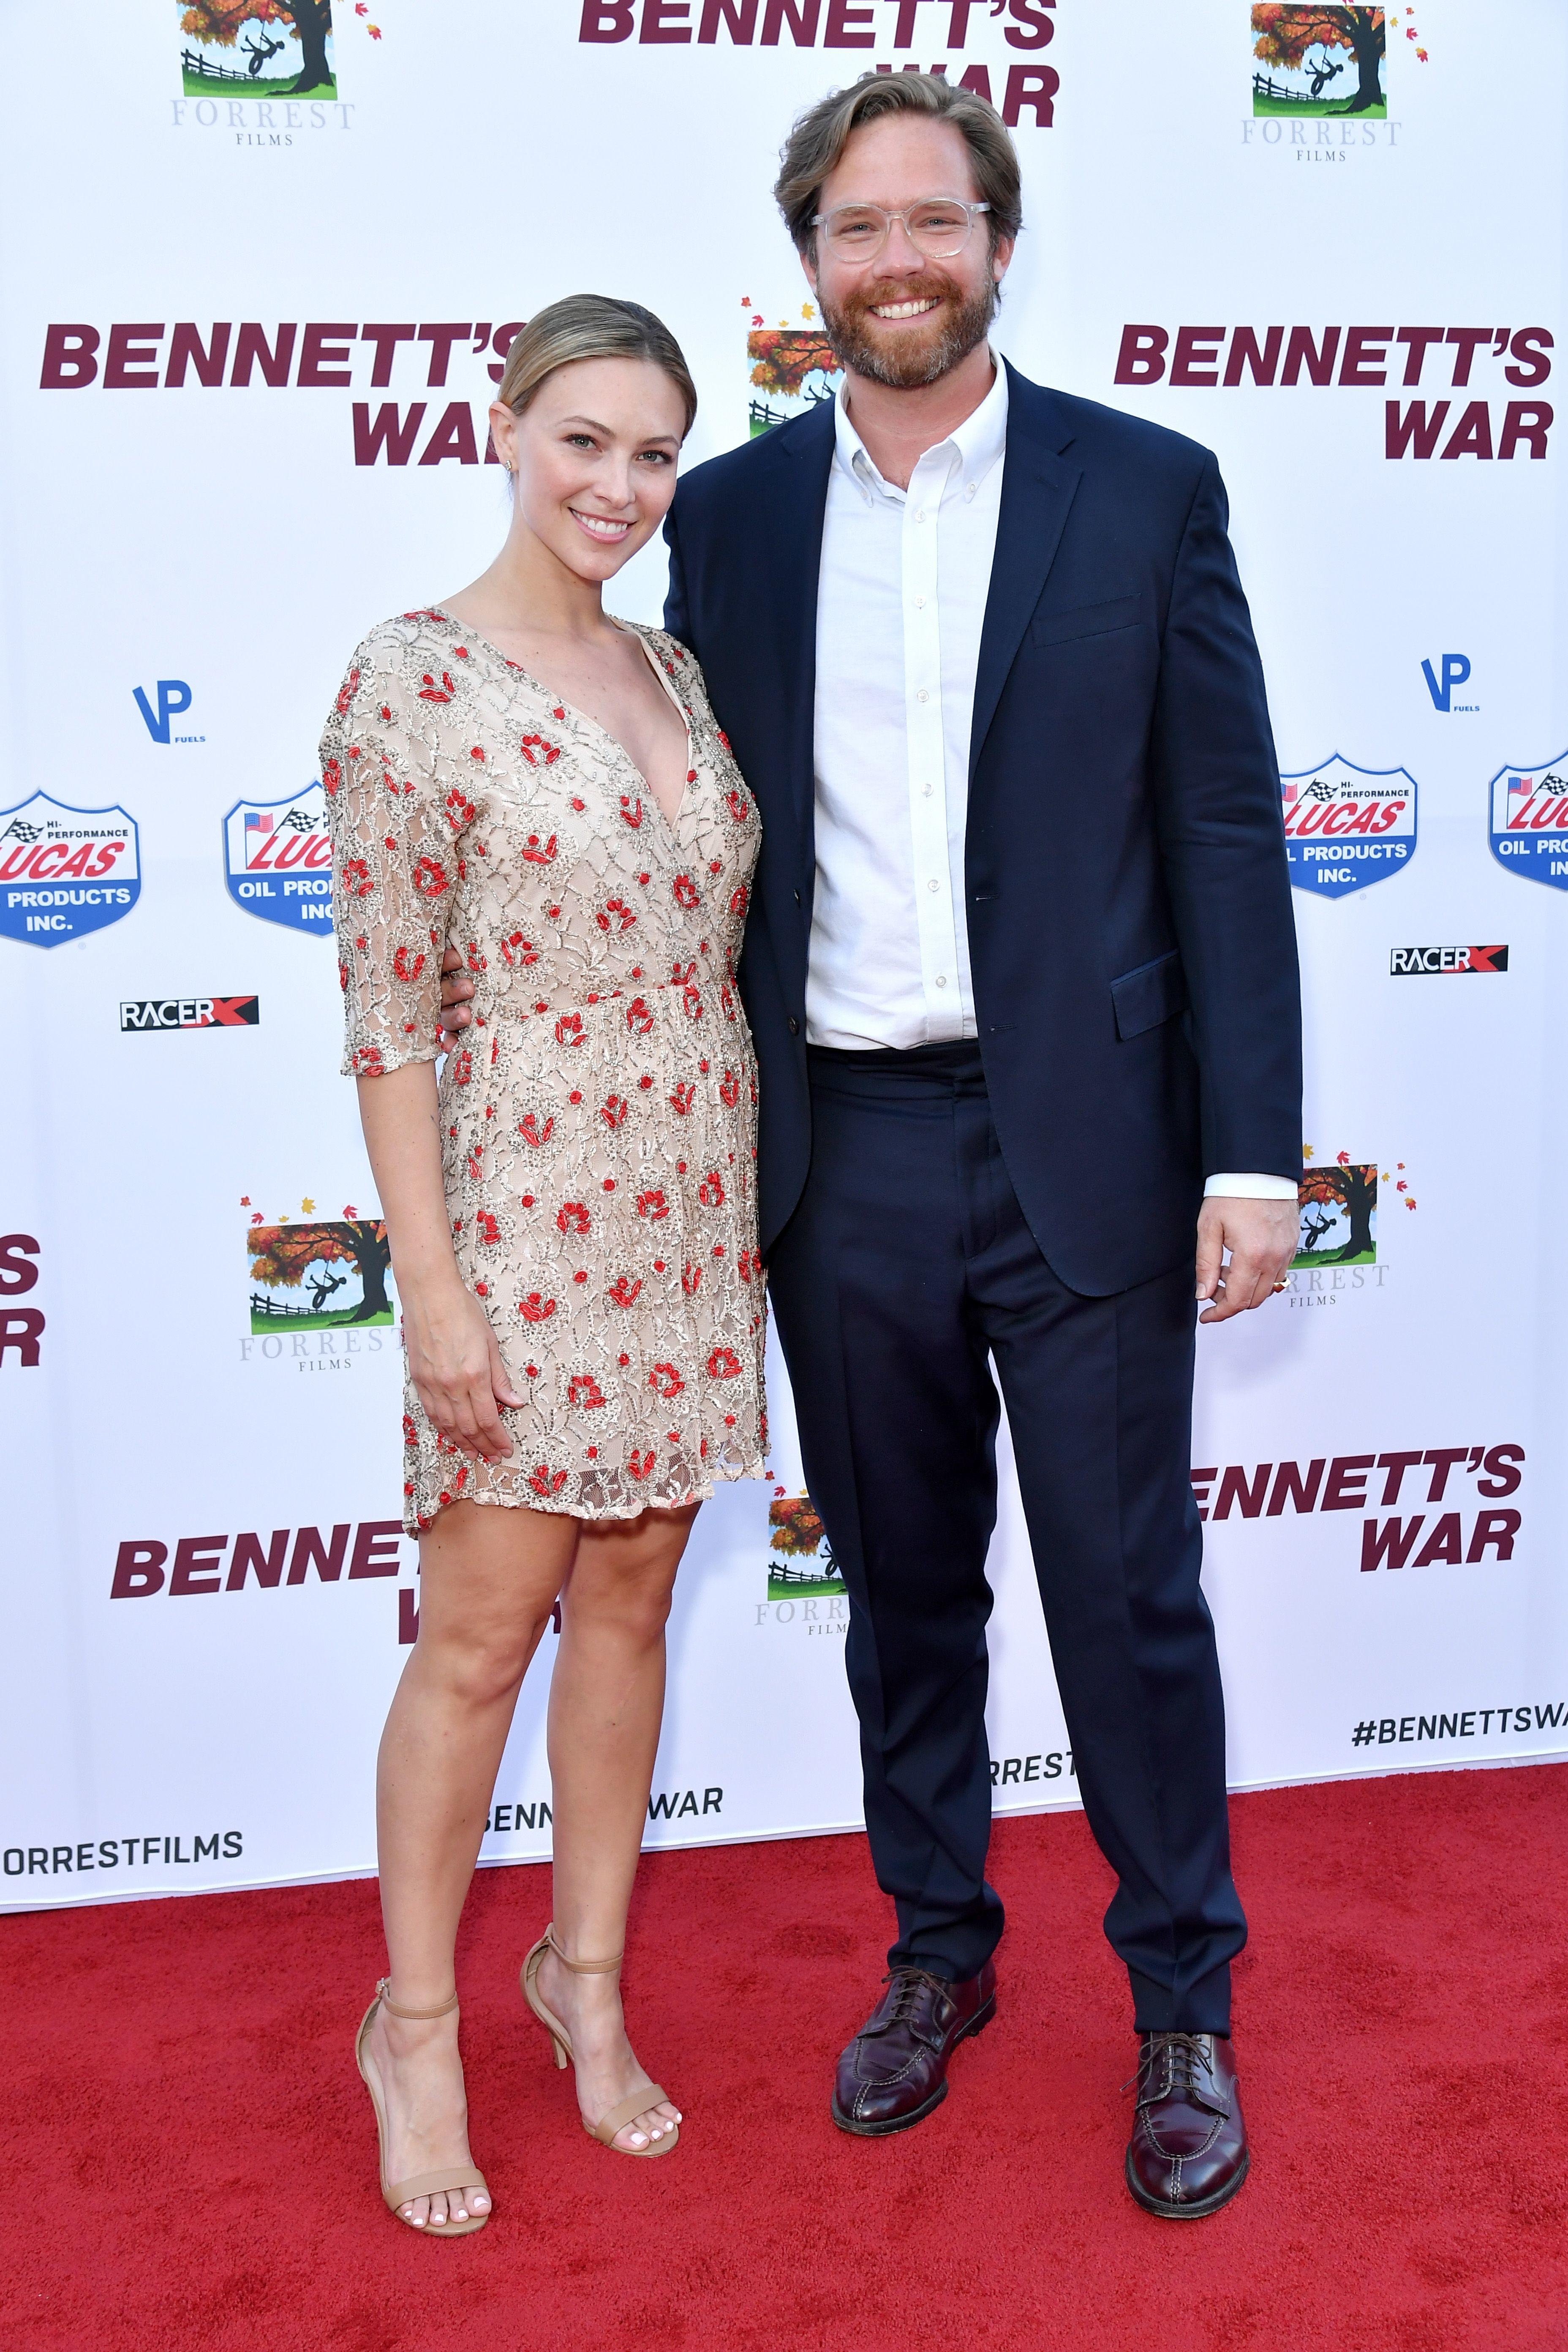 Jennifer Finnigan Feet courtney hope turner's feet << wikifeet